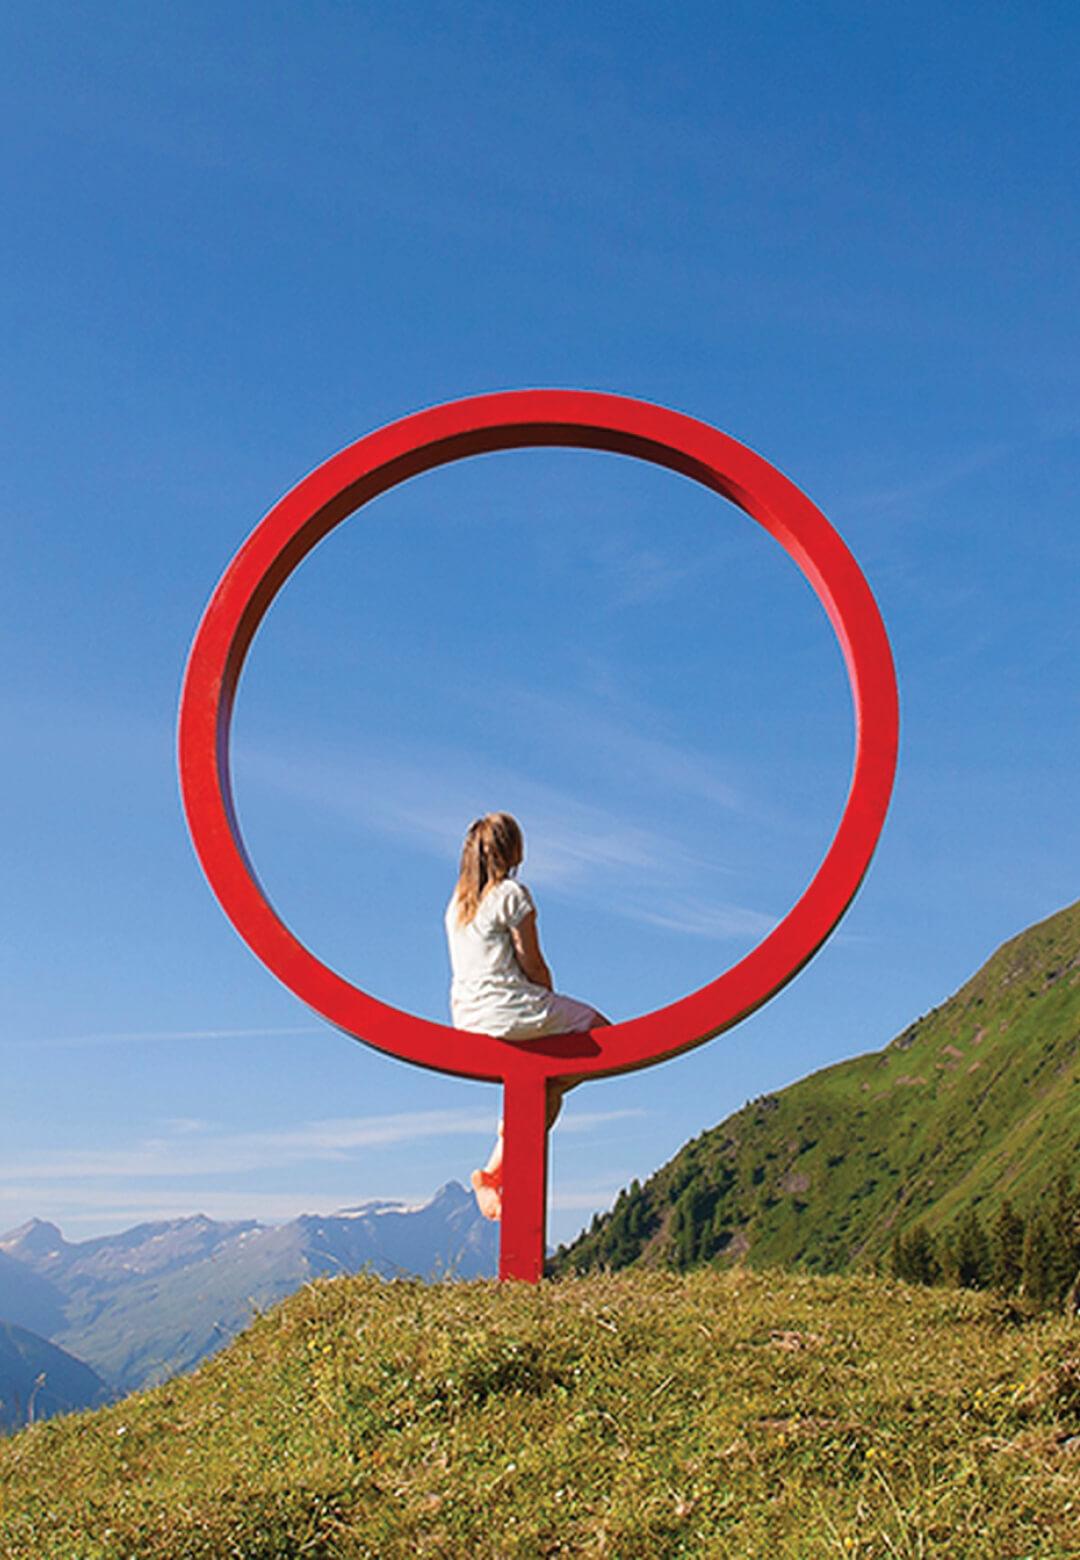 Cloud Catcher | Karolin Schwab | STIRworld